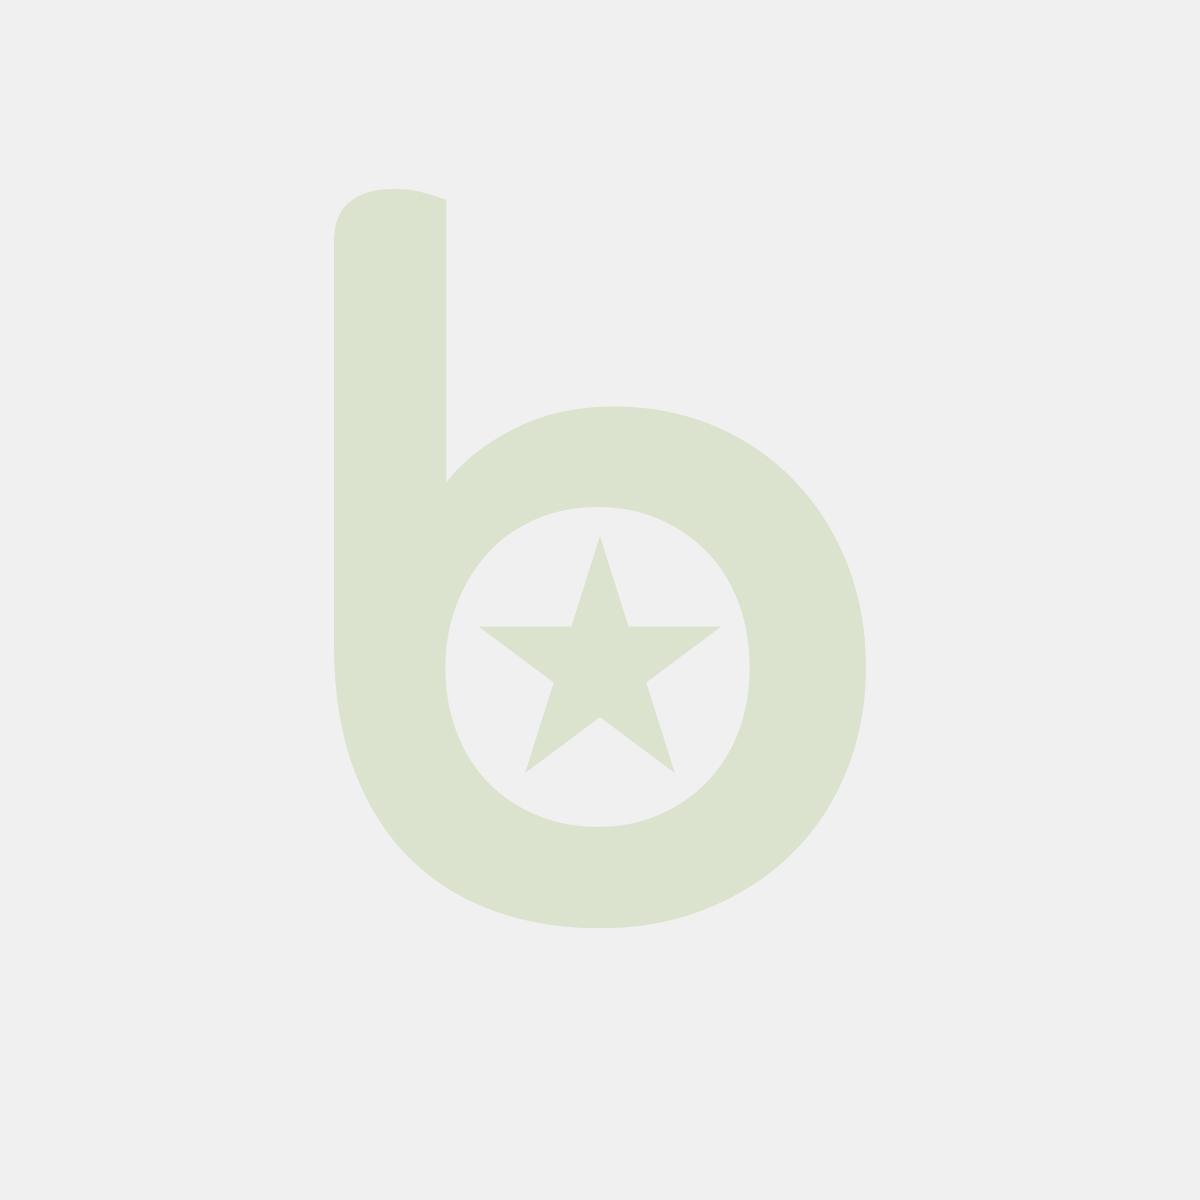 LUCART dozownik mydła 0,55L EcoNatural czarny